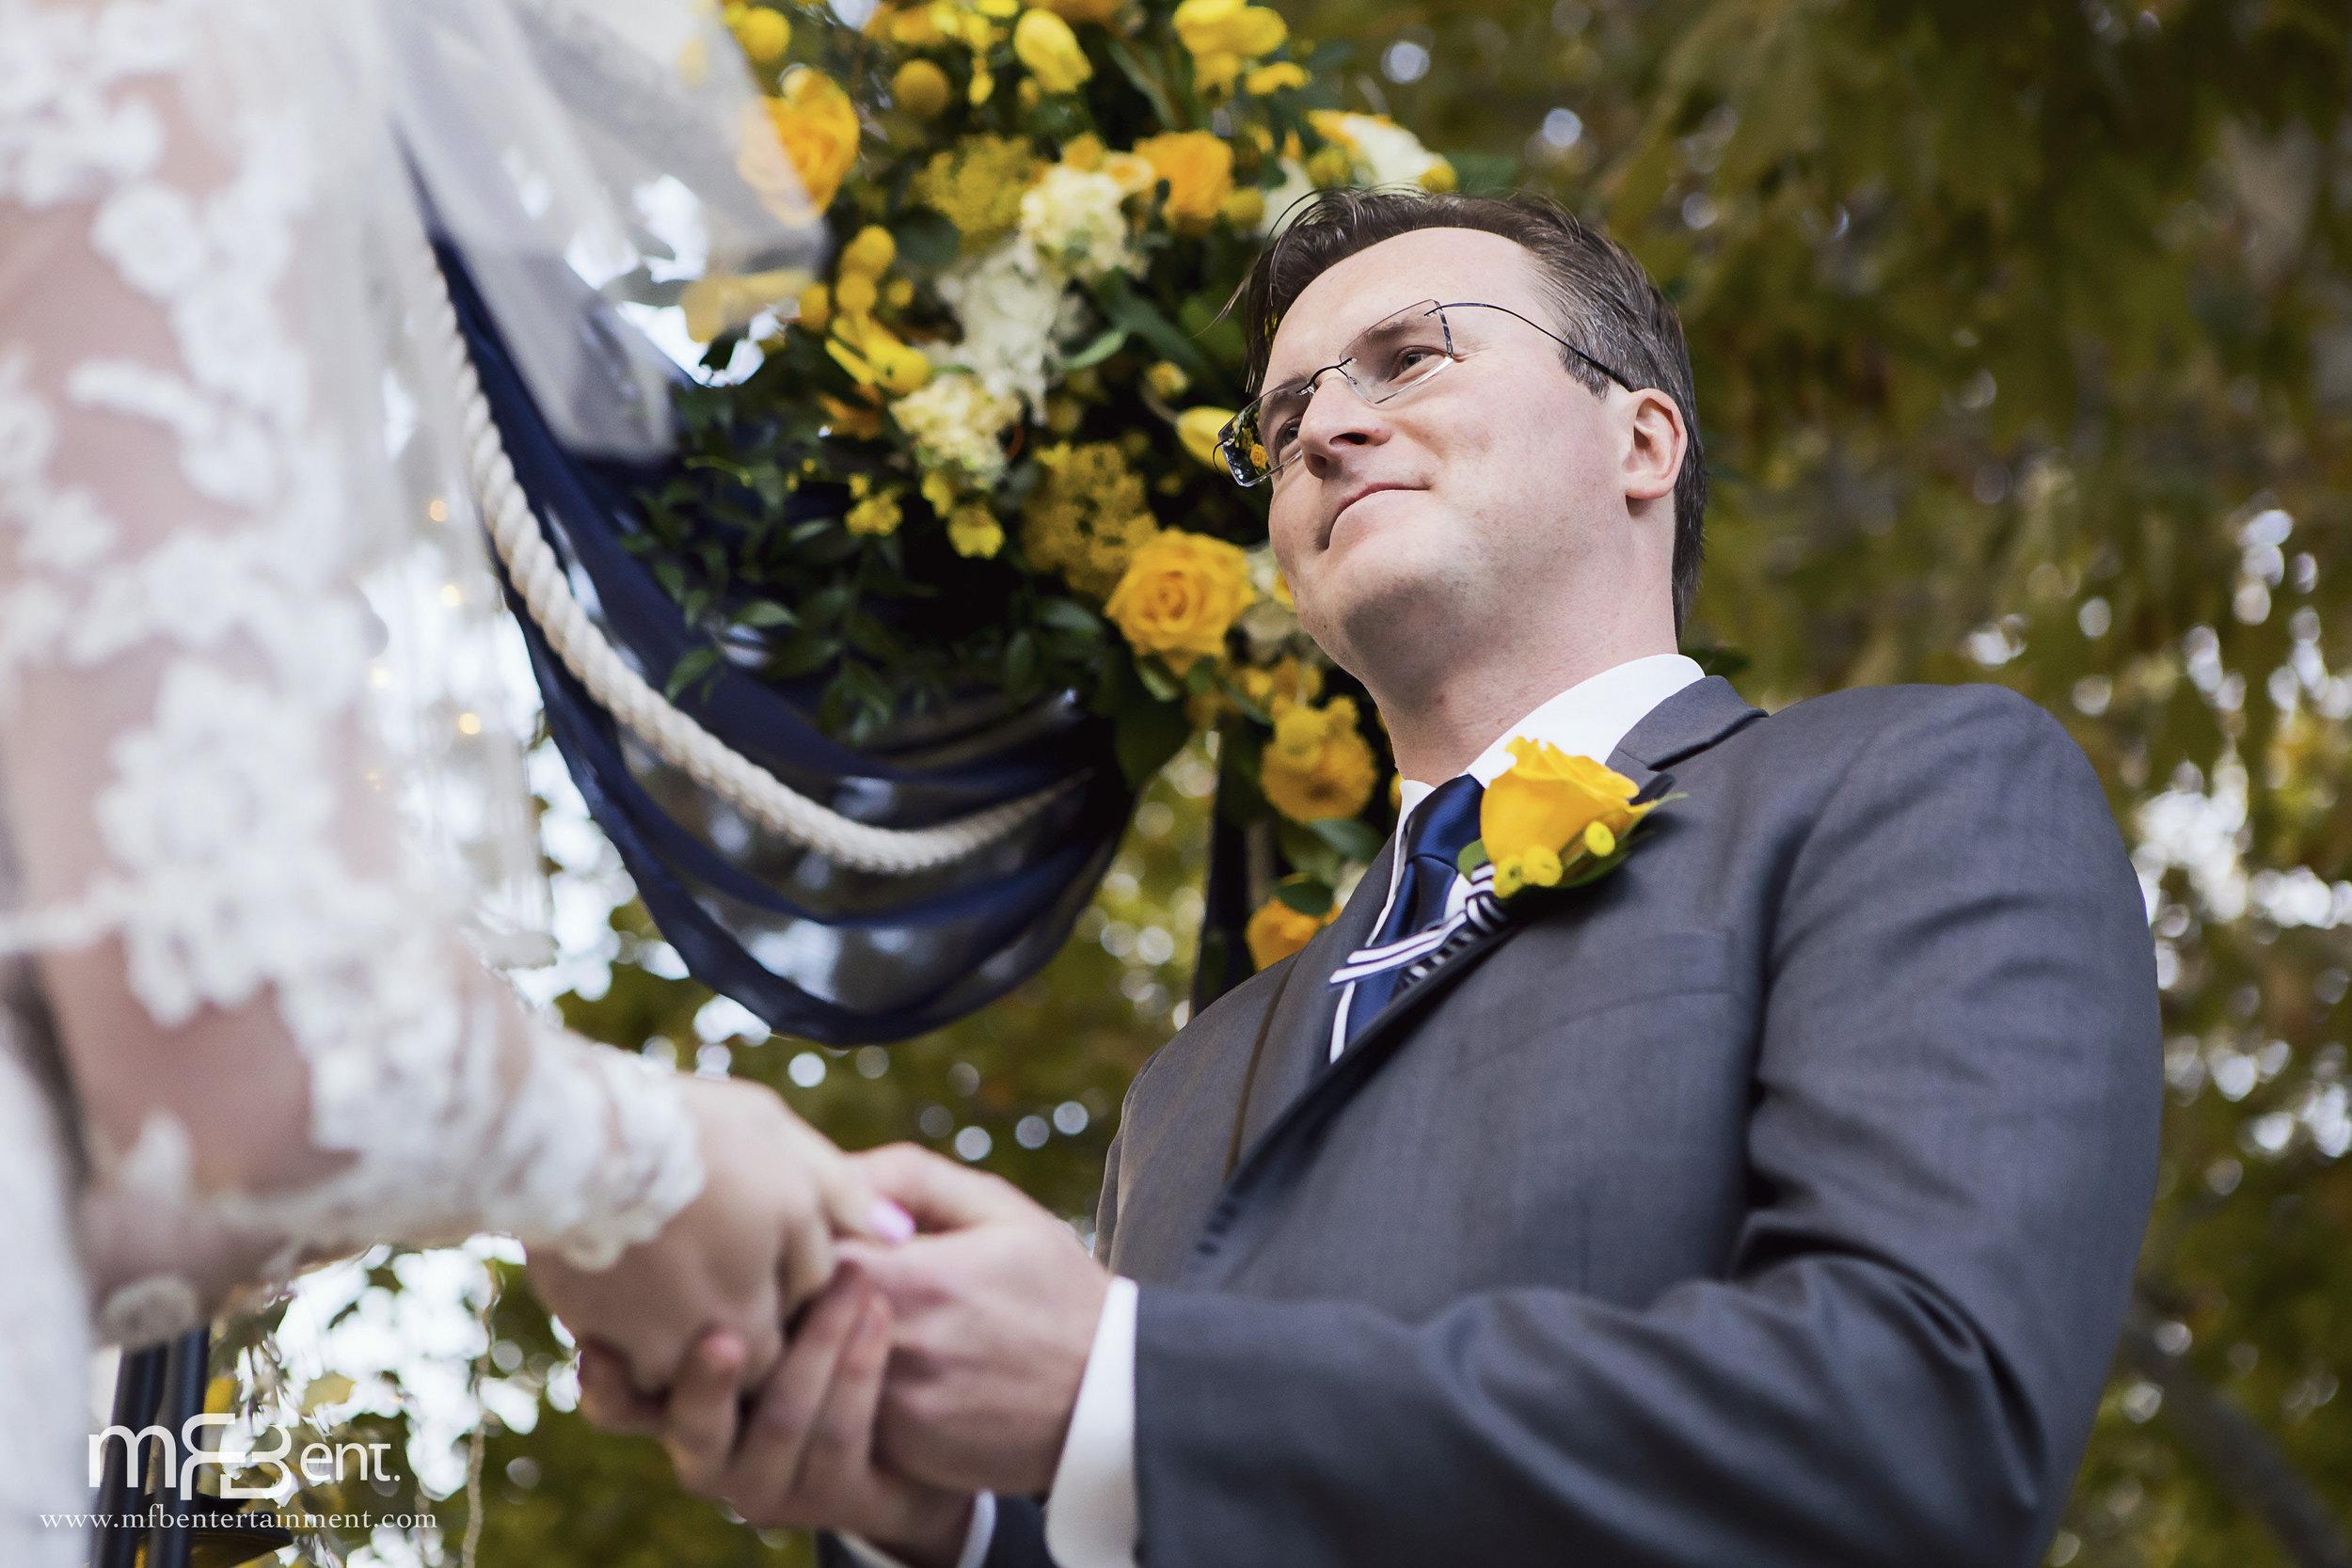 PIOTR CHELSEA WEDDING-CEREMONY-0127 L.jpg